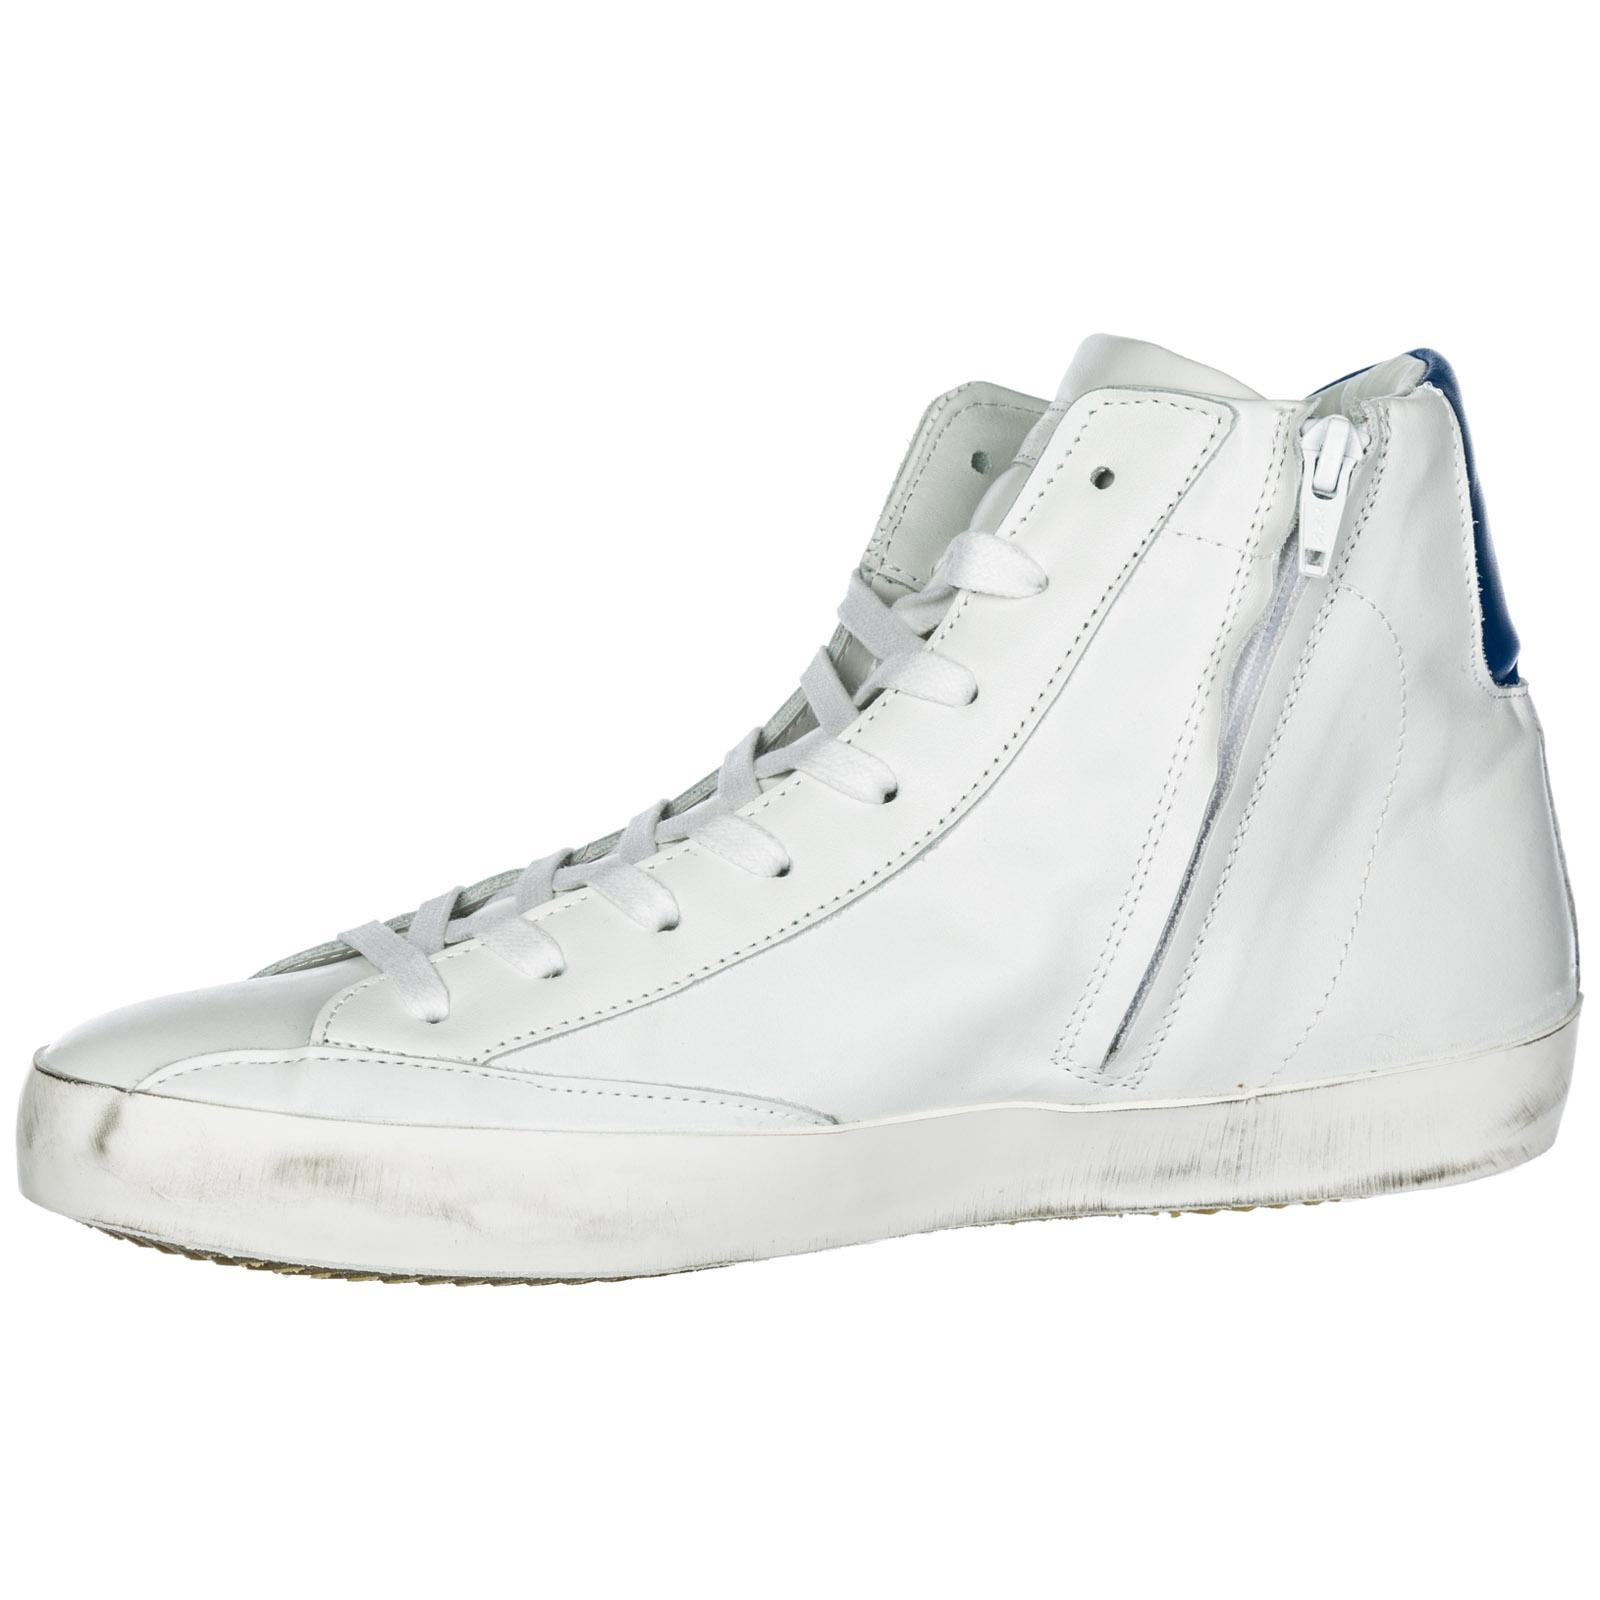 Sneakers alte Philippe Model Paris A19ECLHUVN11 veau neon blanc ... 4955e6eb743